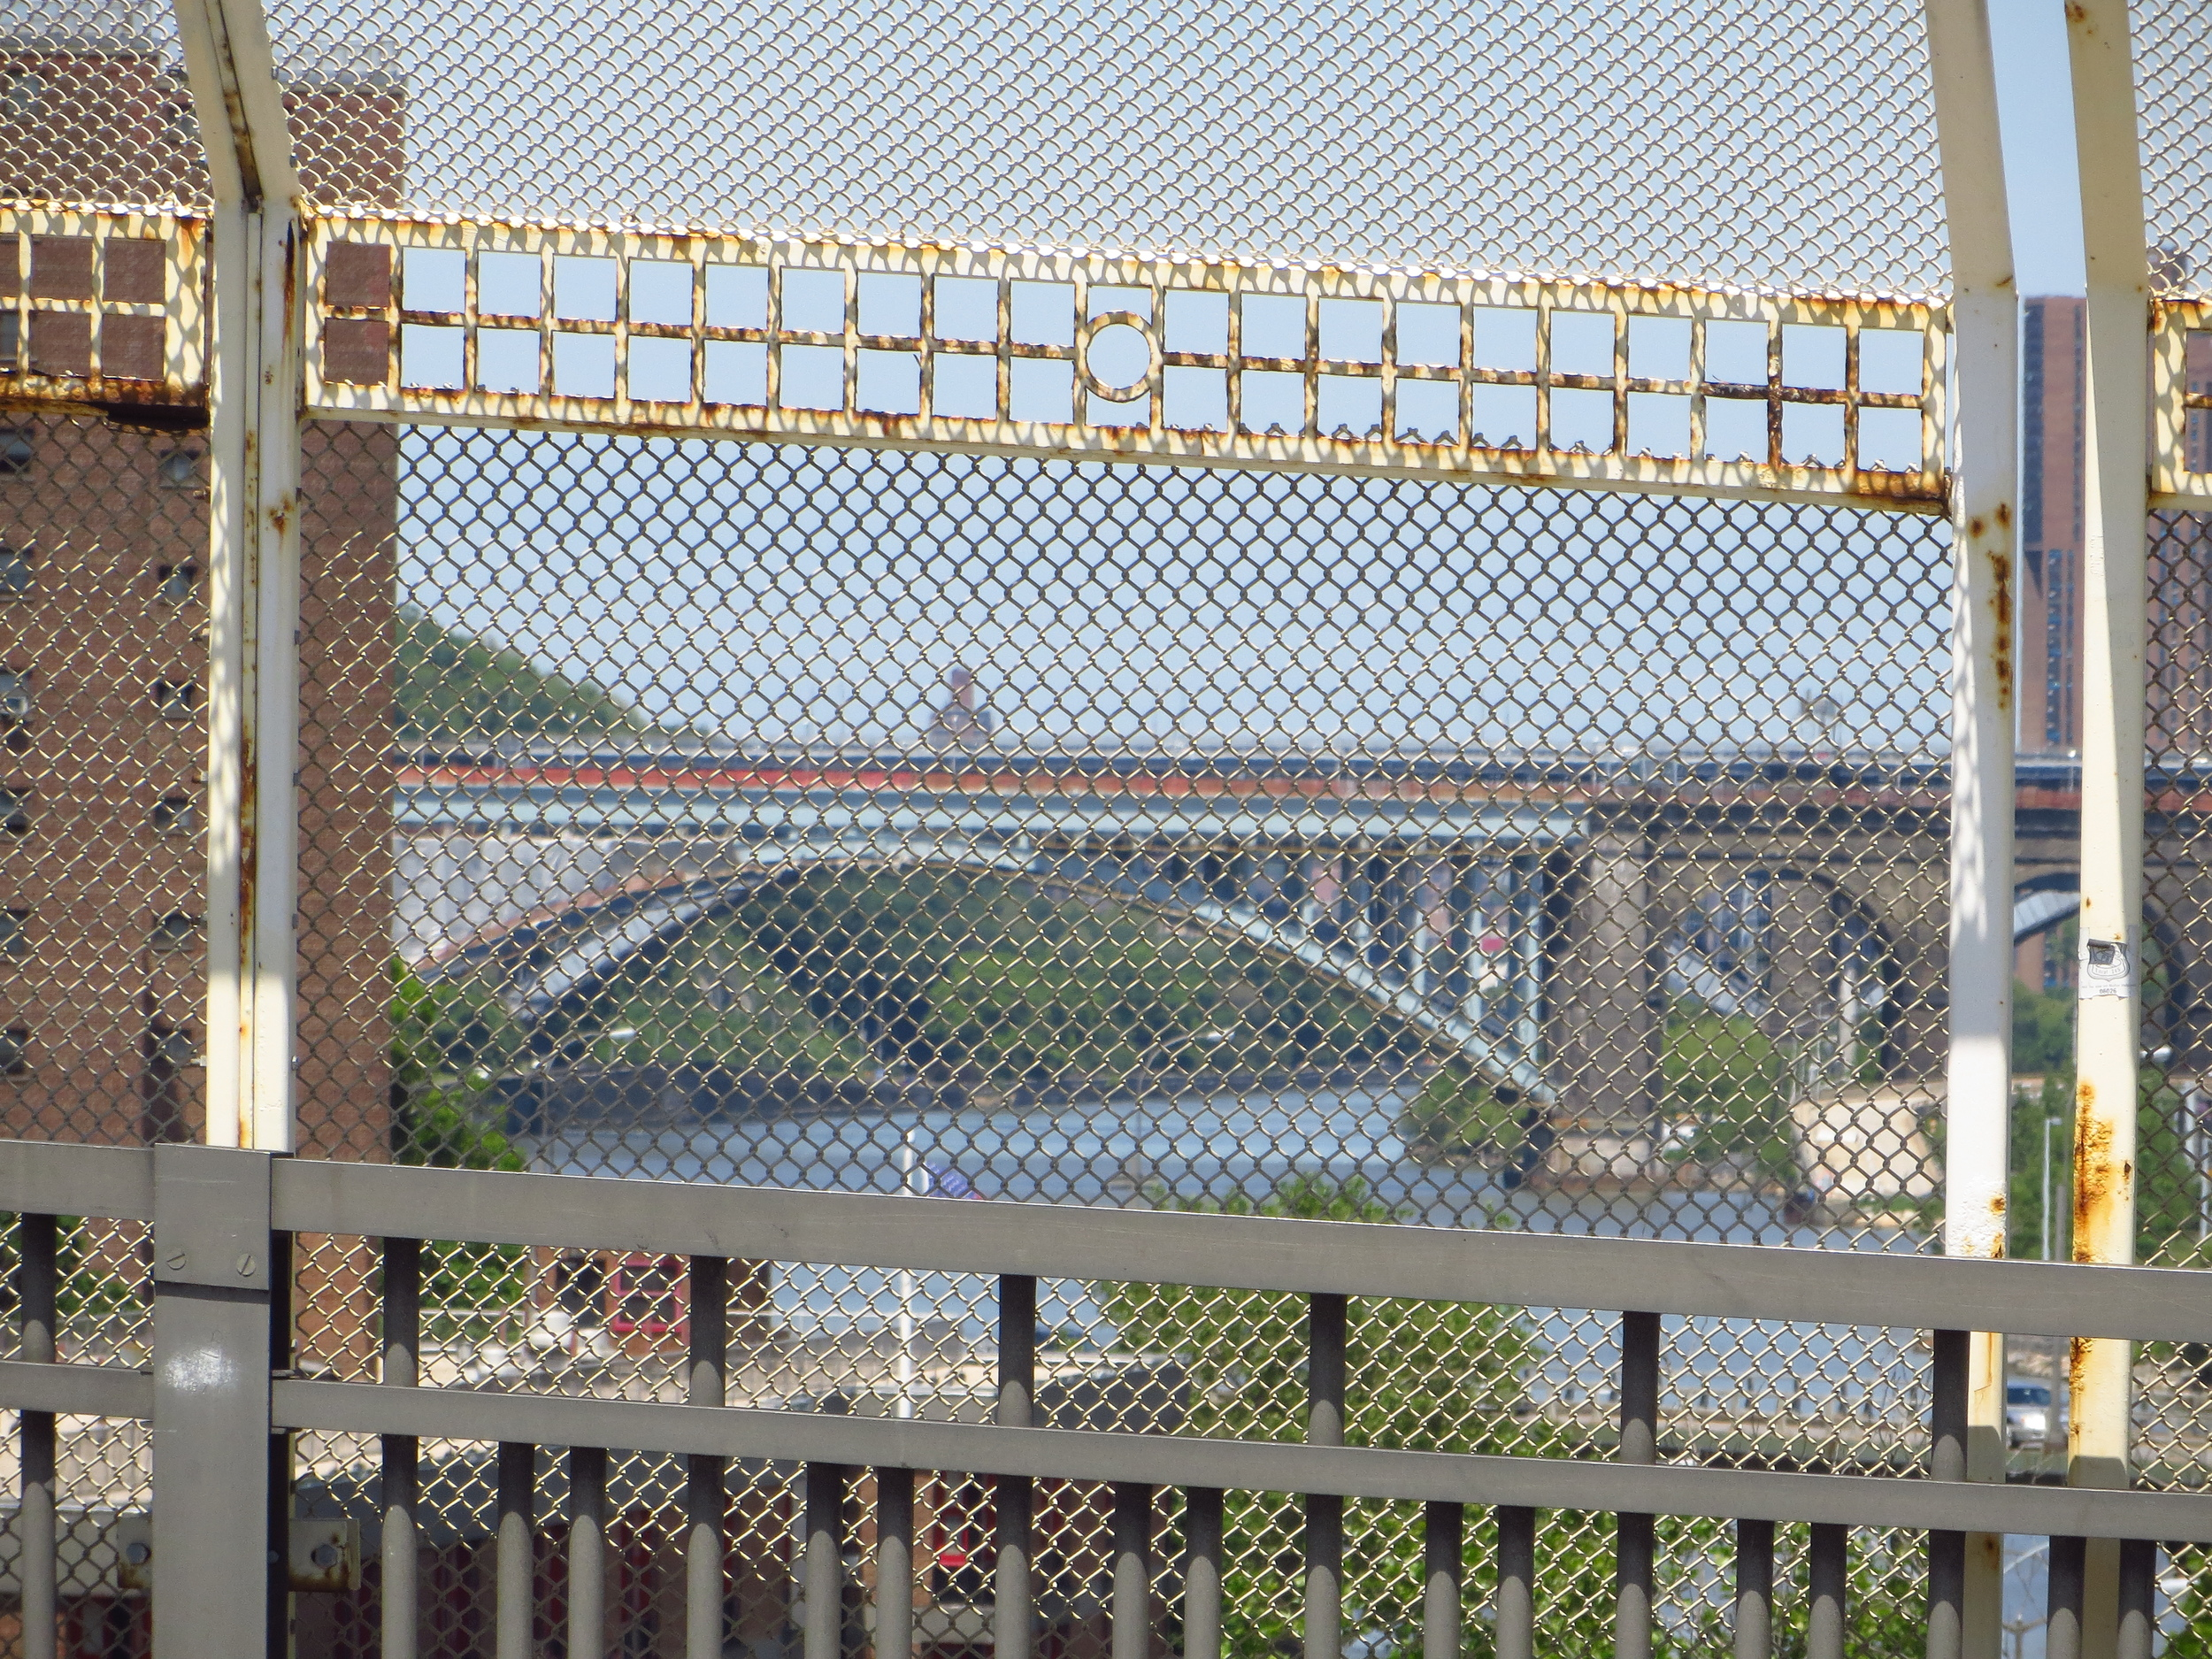 View of Harlem River